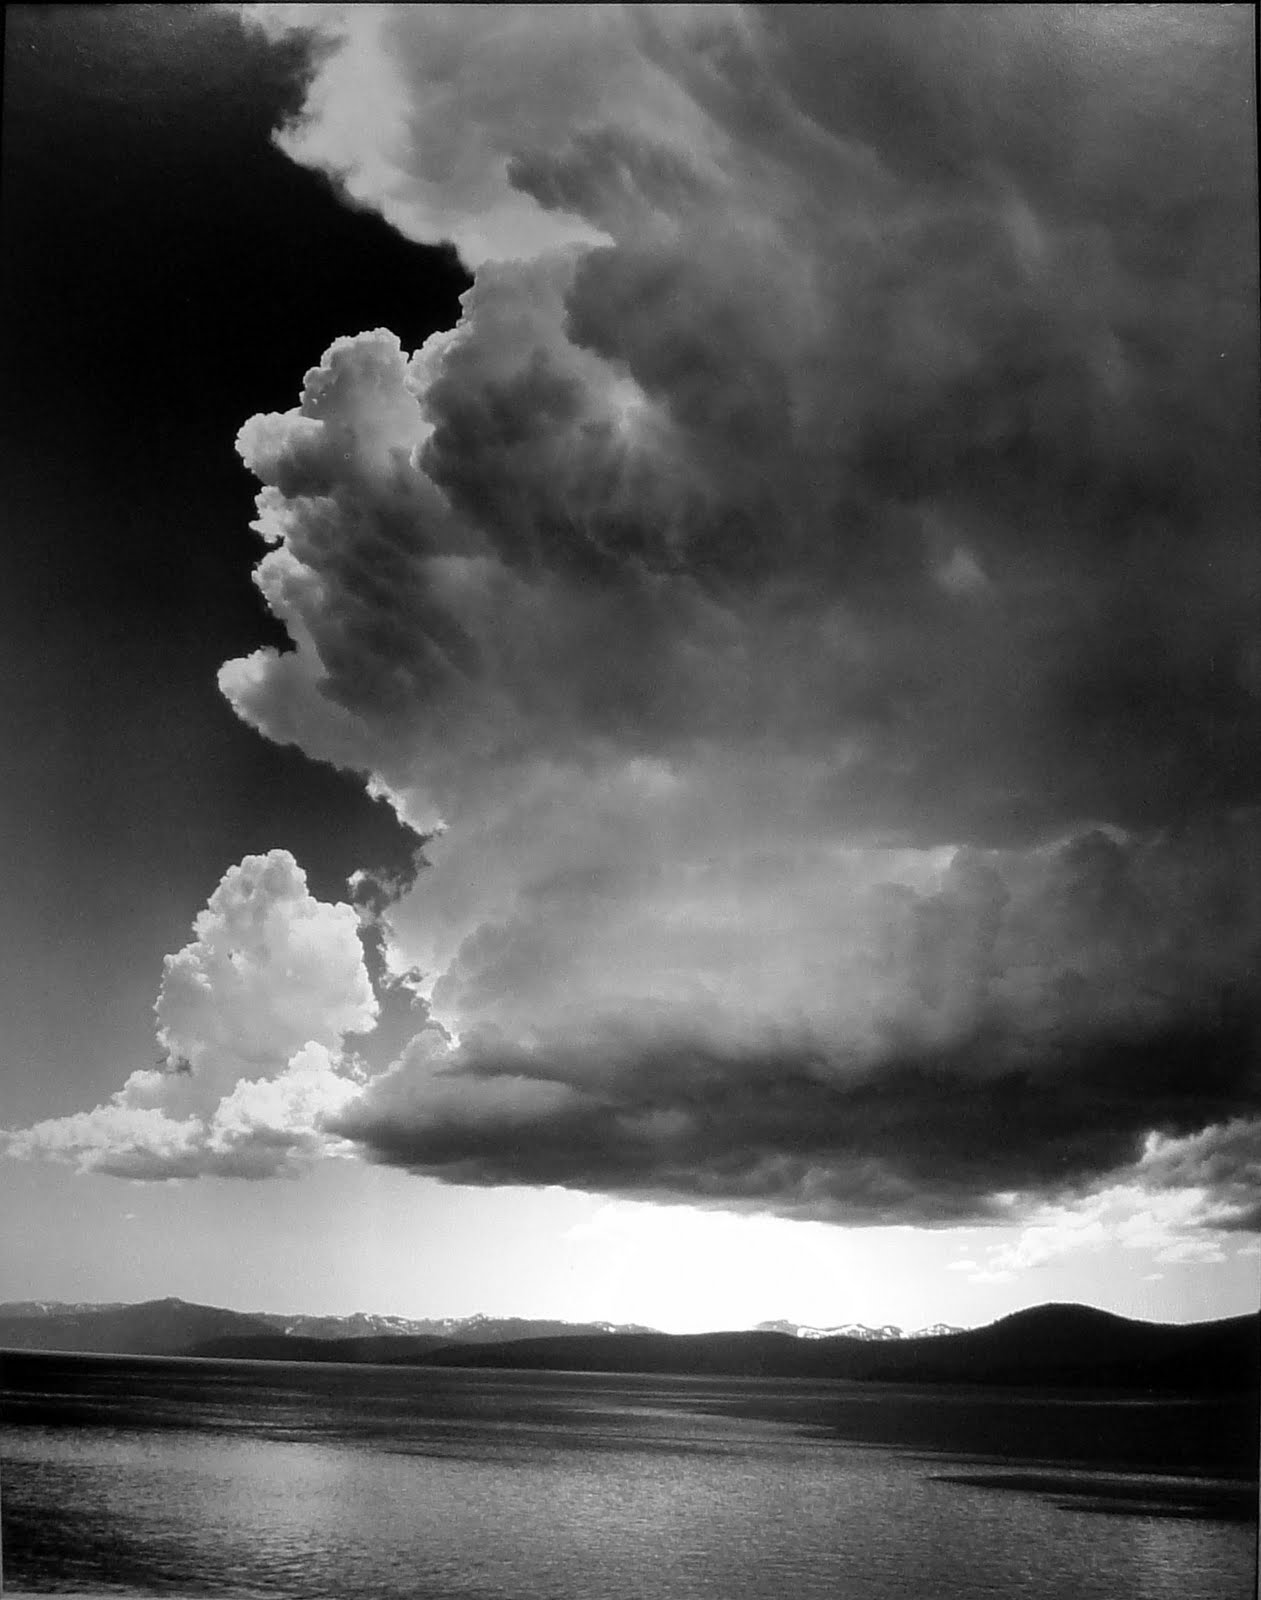 ansel adams photography - photo #19